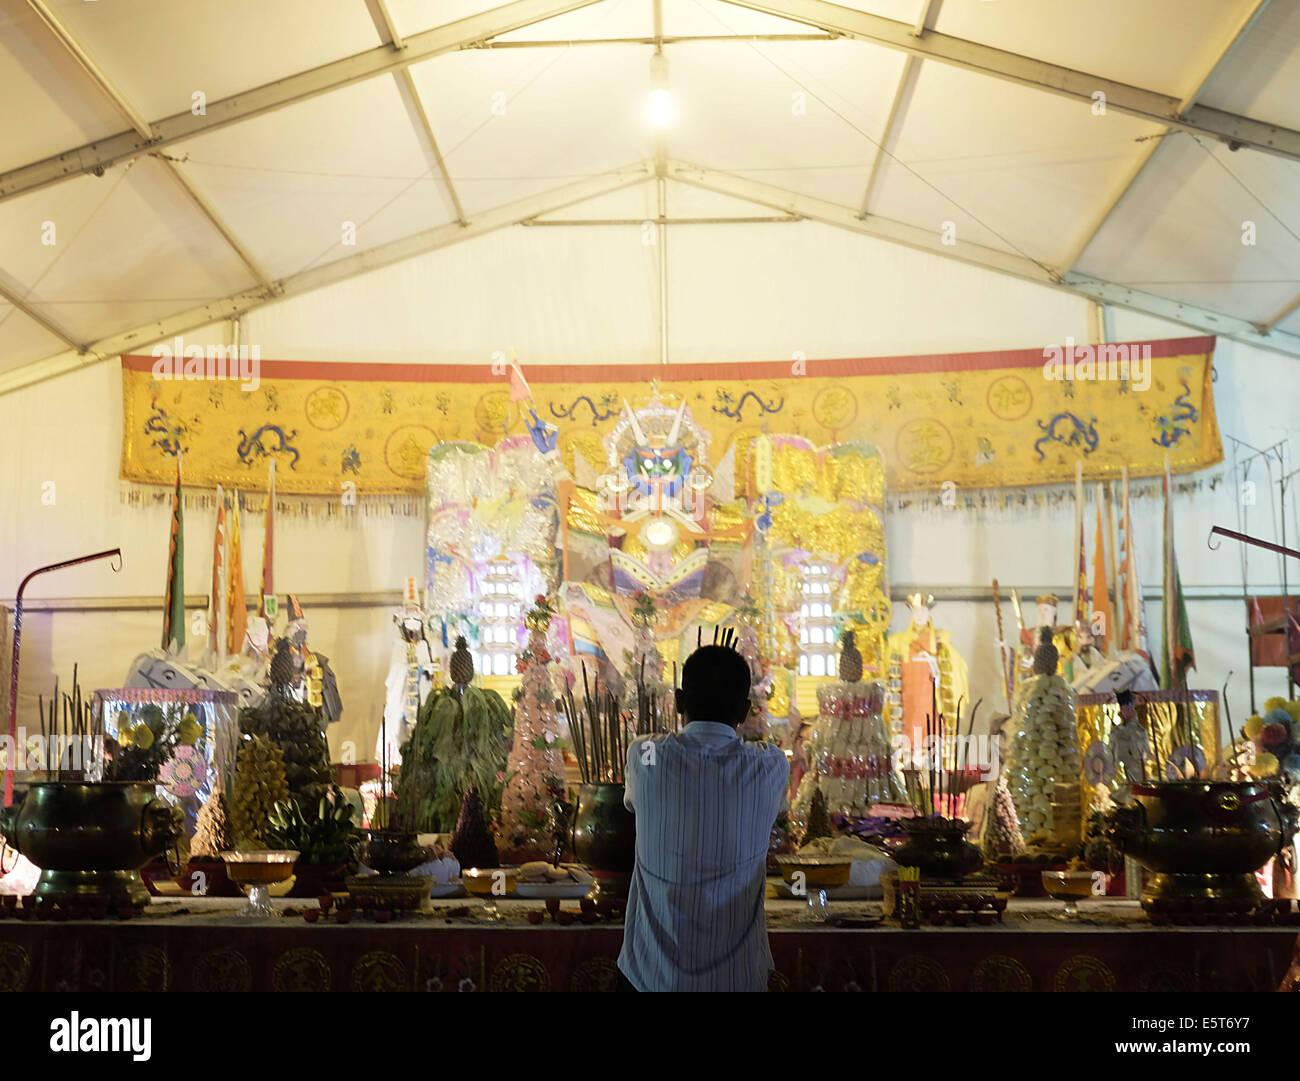 Kajang, SELANGOR, MALAYSIA. 5th Aug, 2014. An Ethnic Chinese devotee handles lit incense sticks during the festive - Stock Image